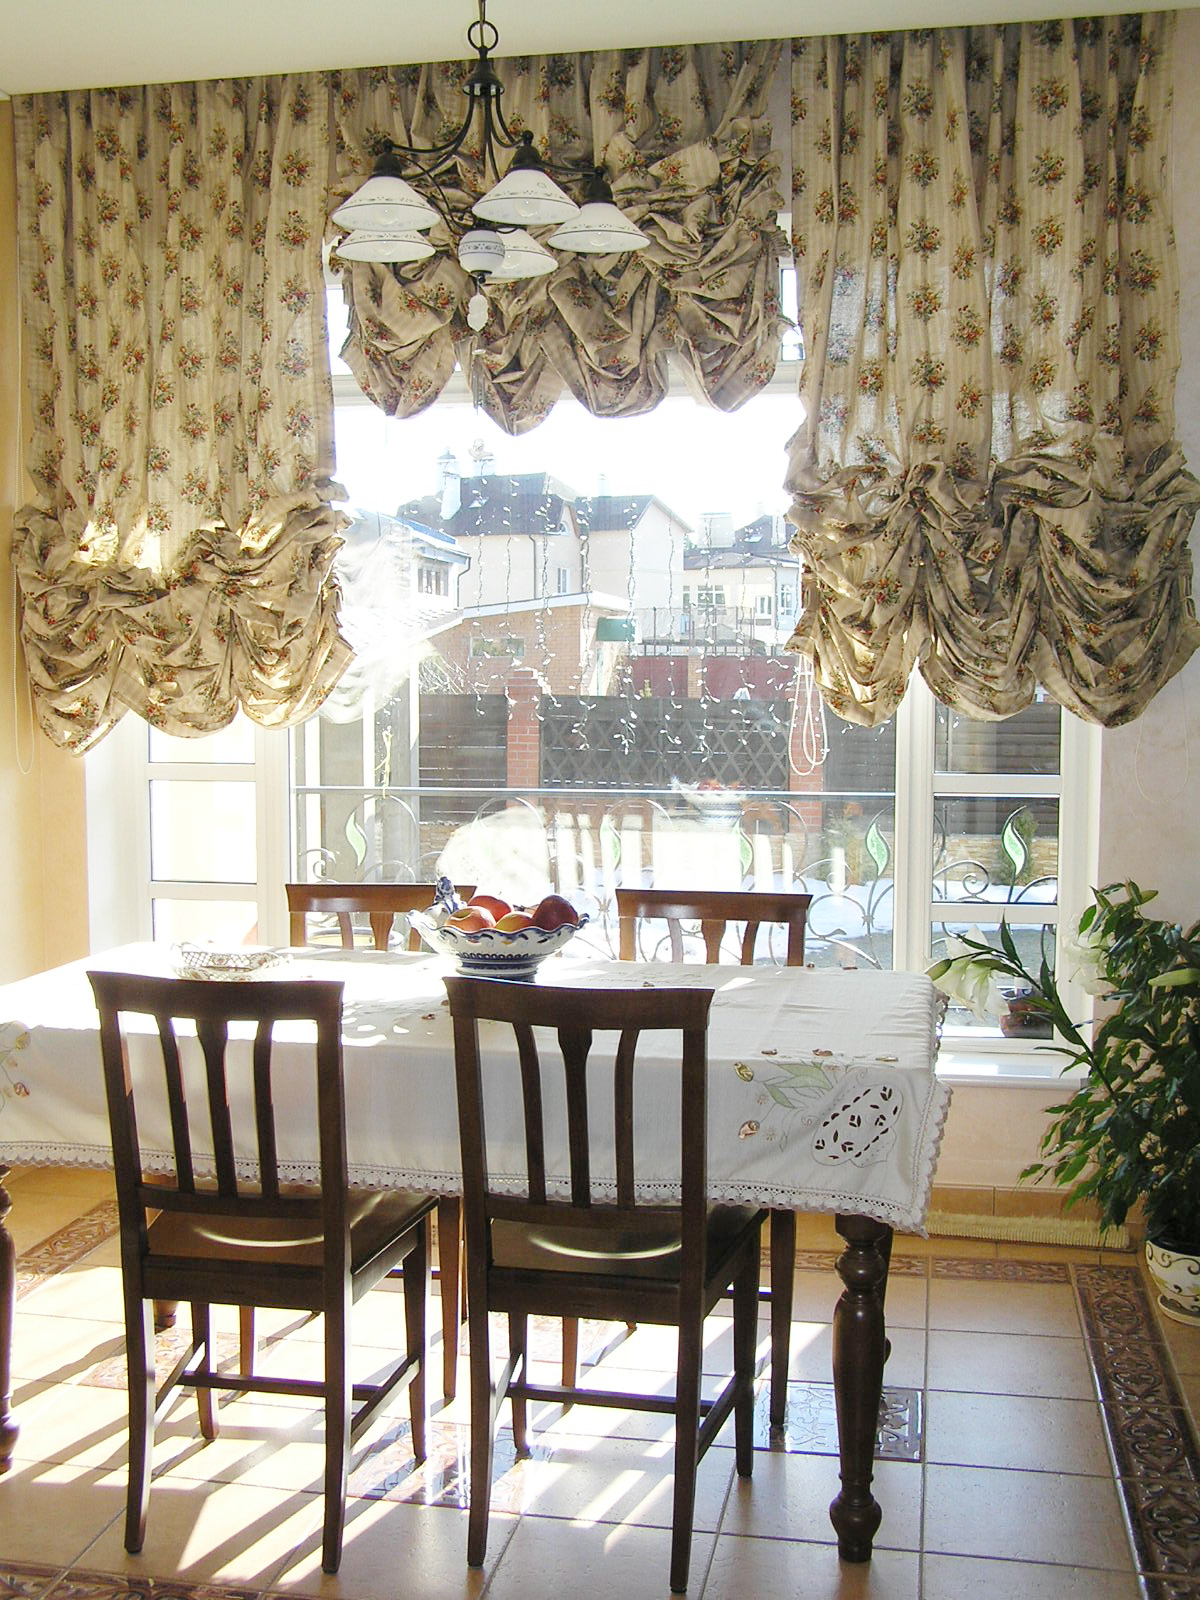 Кухня в стиле прованс с французскими шторами